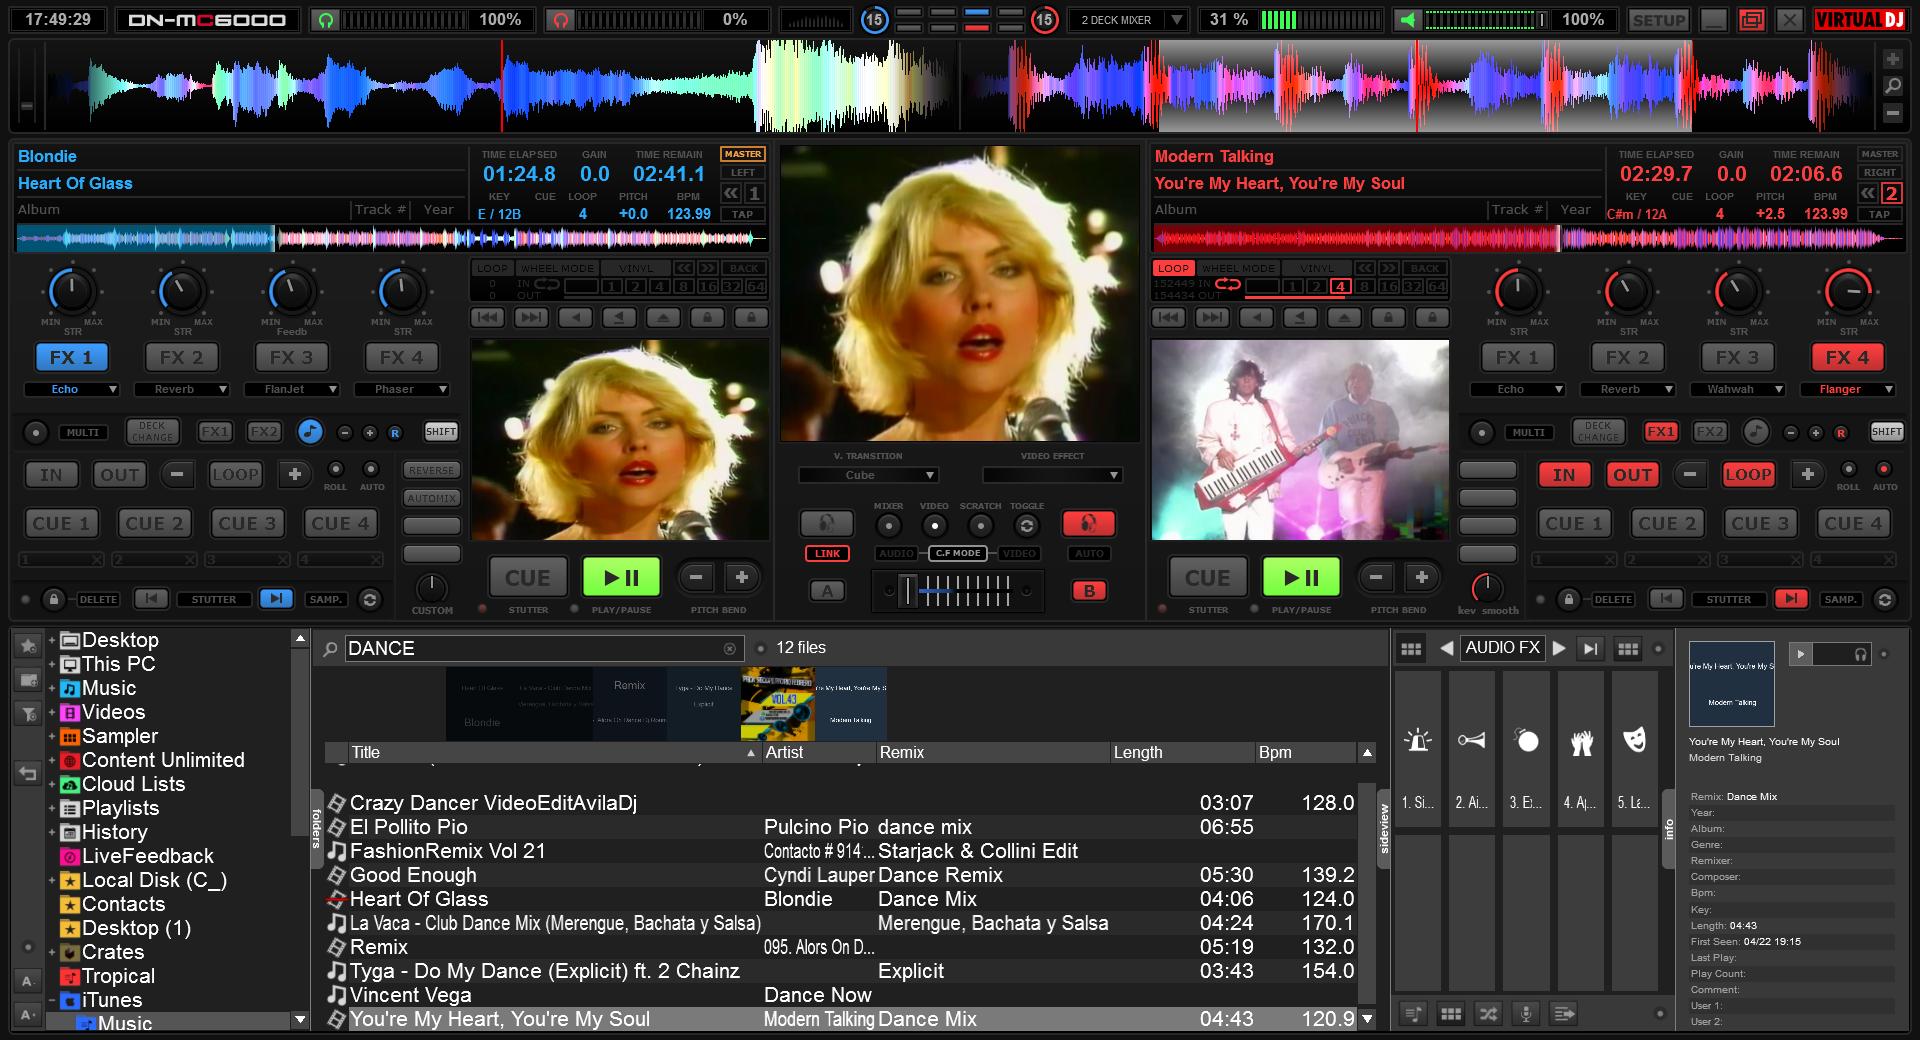 DJ Software - VirtualDJ - Skins